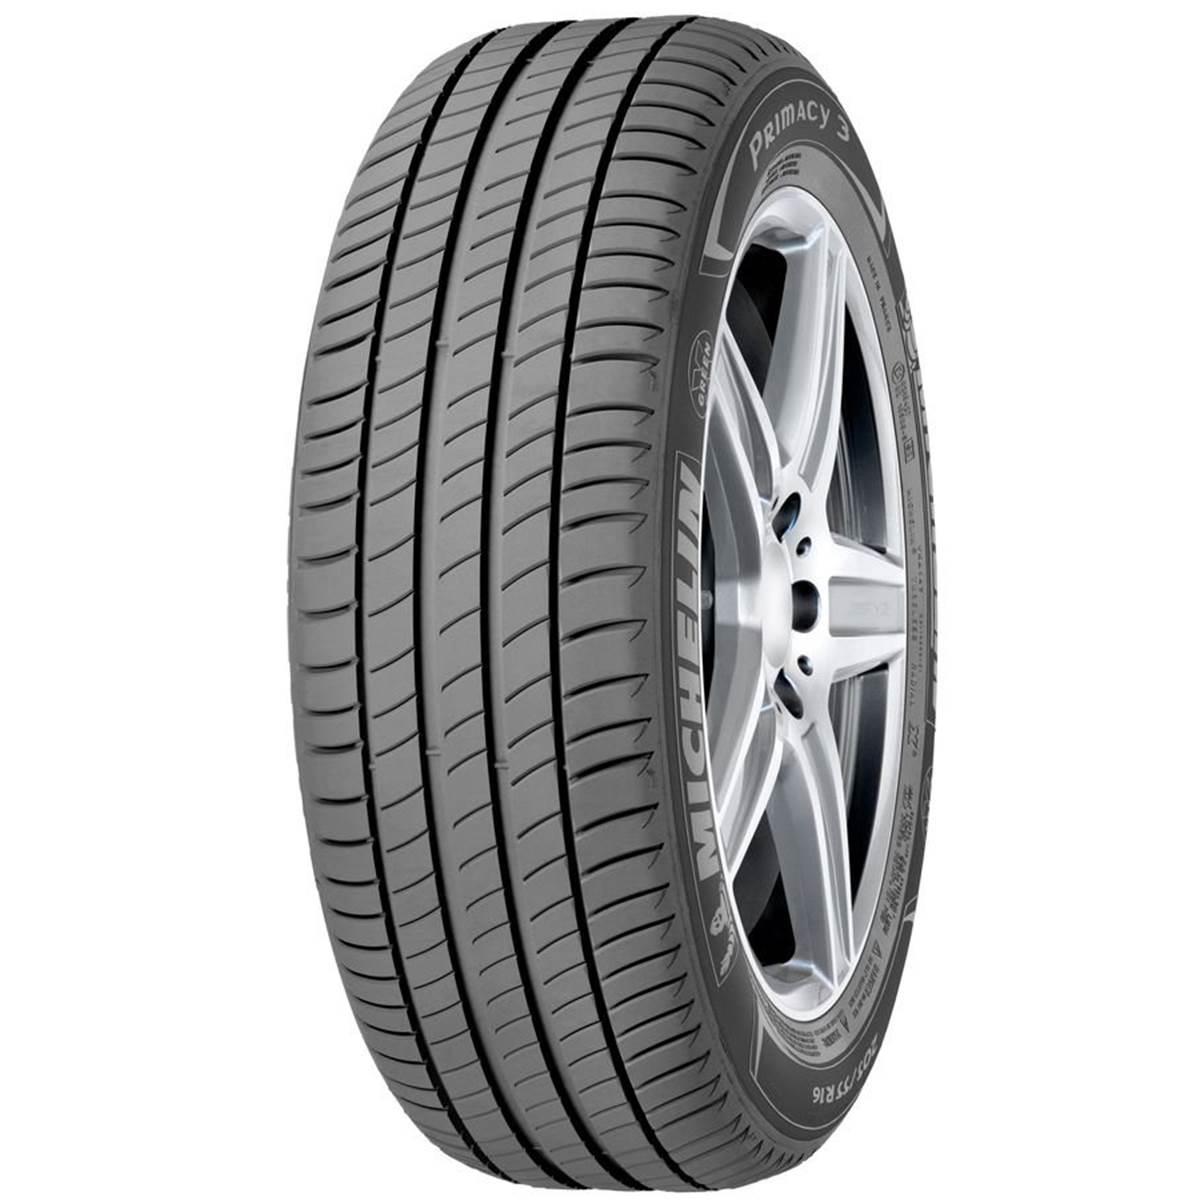 Pneu Michelin 255/45R18 99V Primacy 3